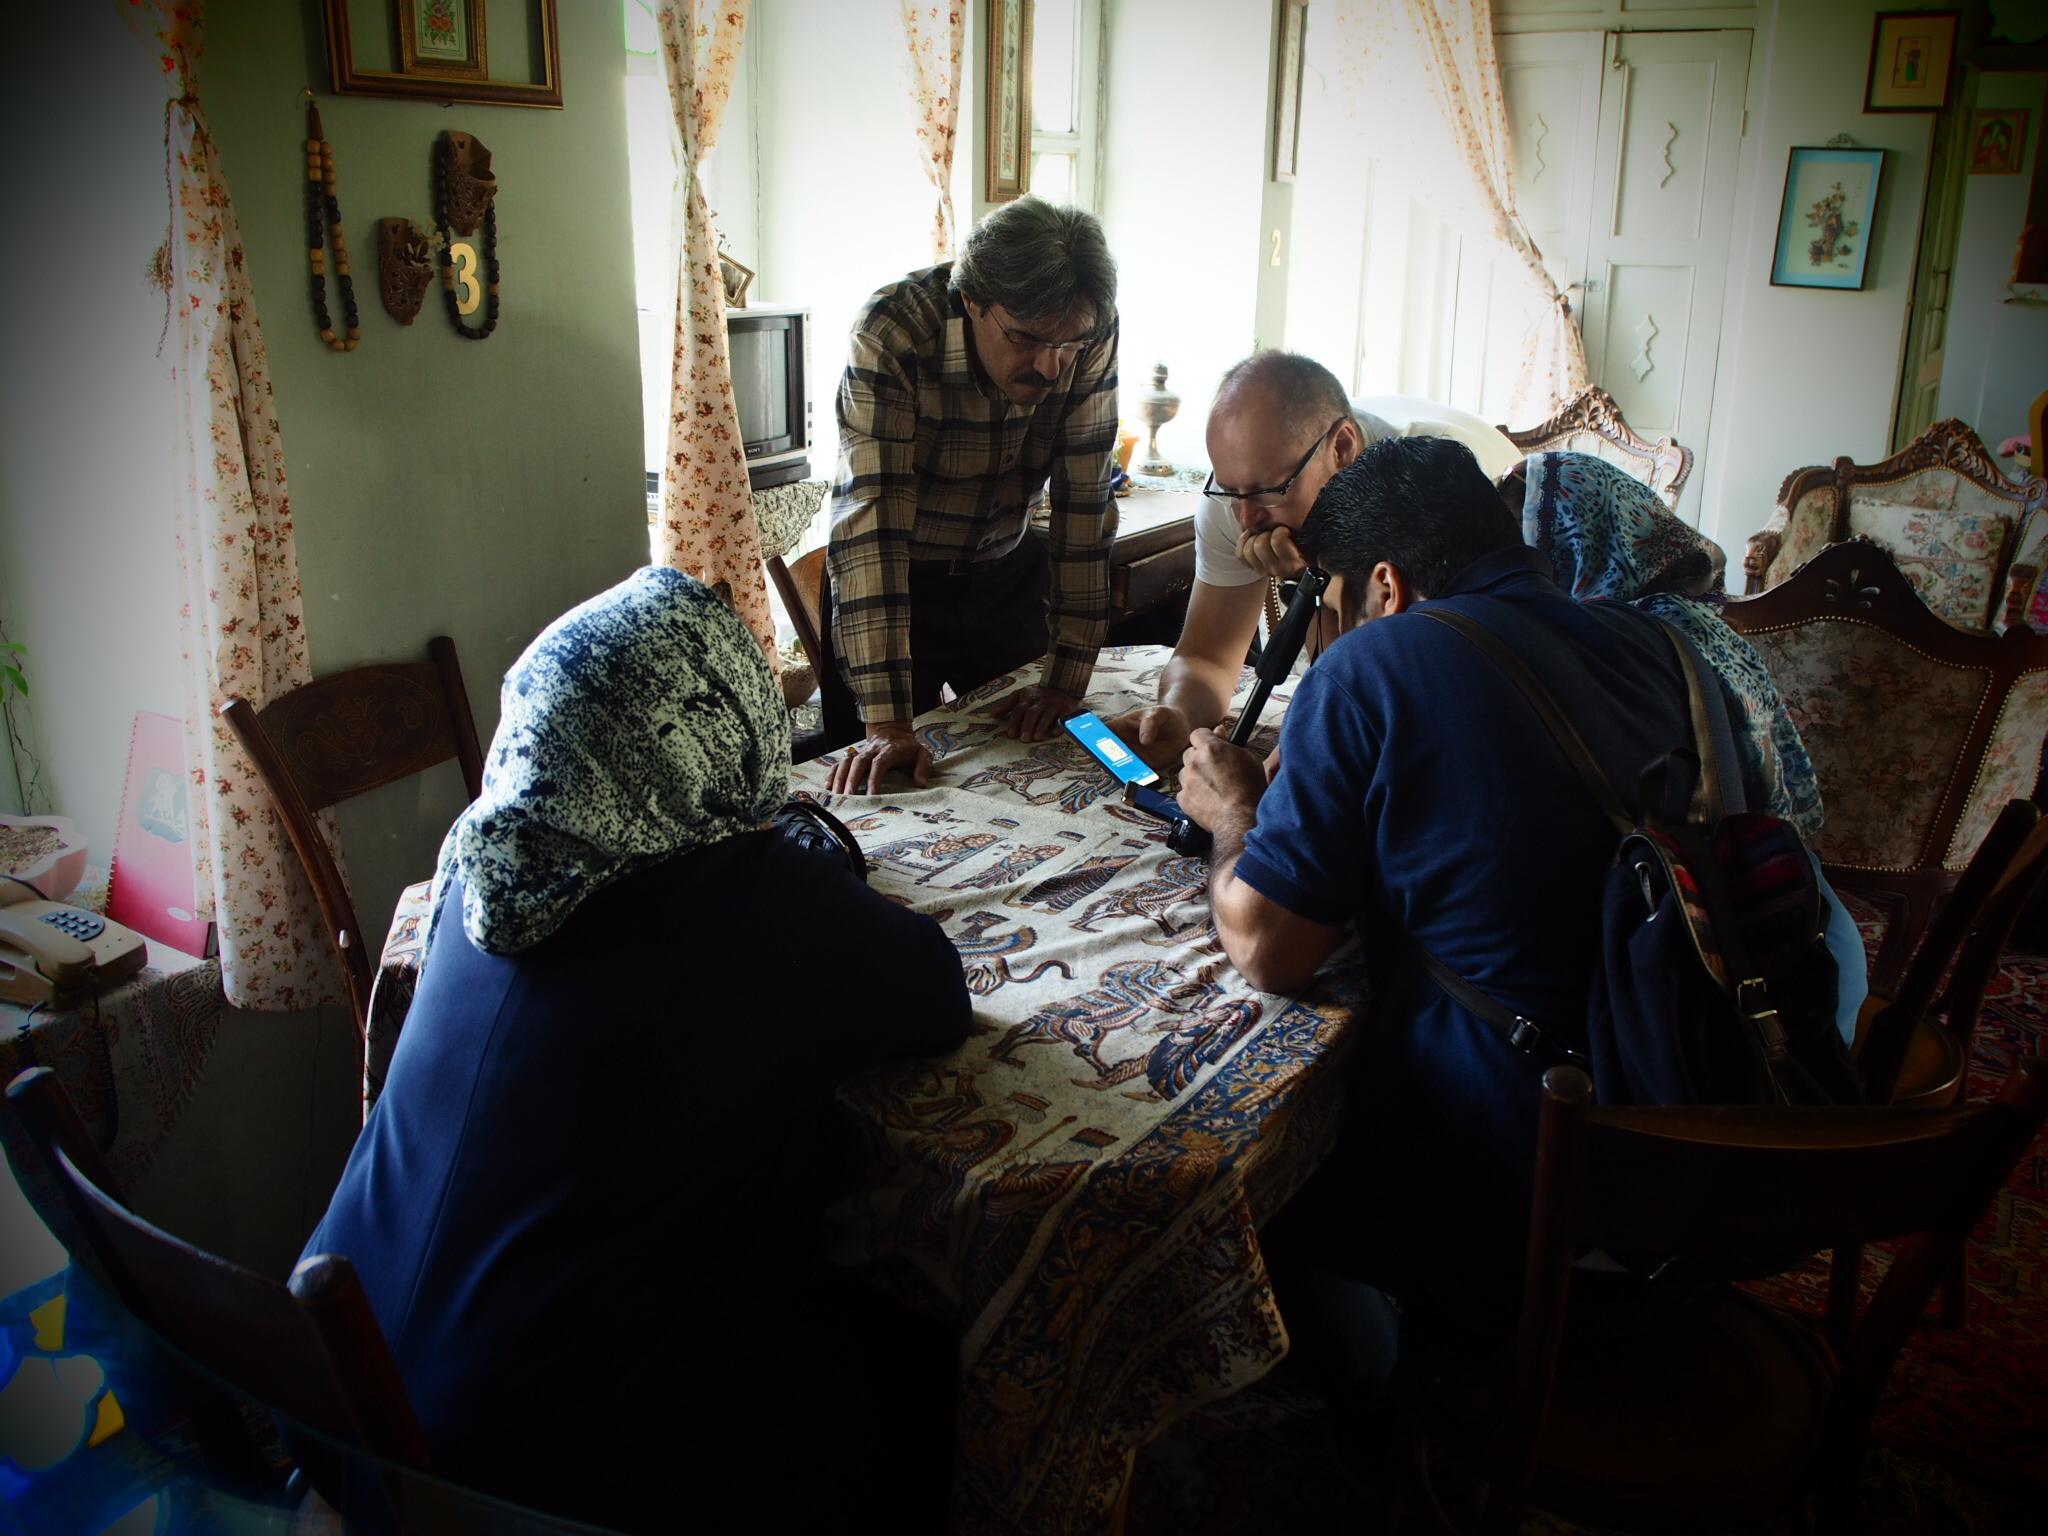 Gruzja-Armenia-Iran-Stambuł. Dzień 12: jazda do Yazdu! 10